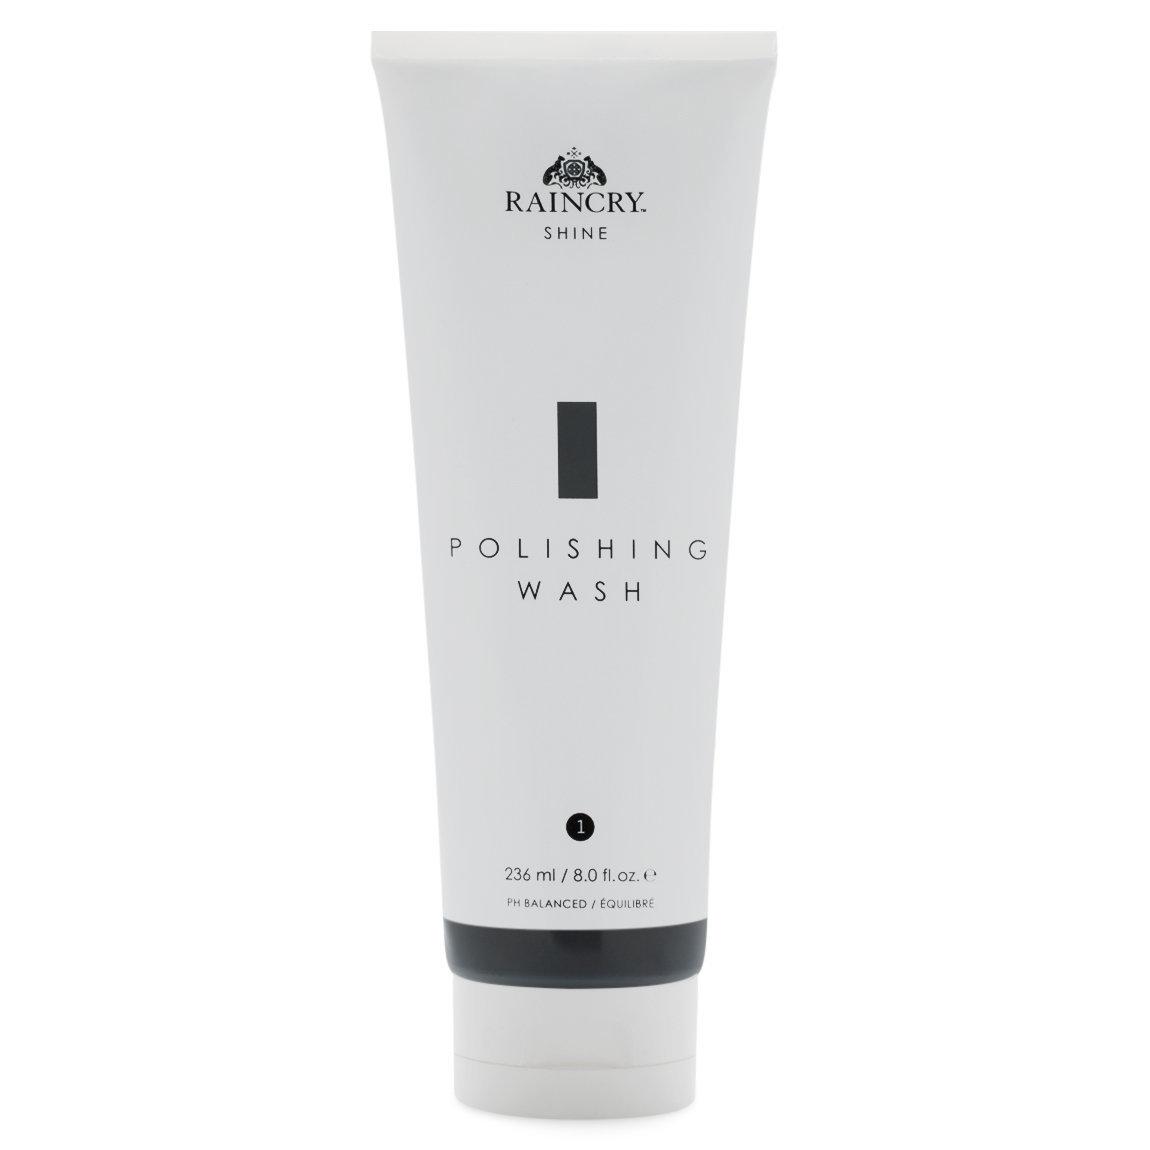 Raincry Polishing Wash Shampoo product swatch.